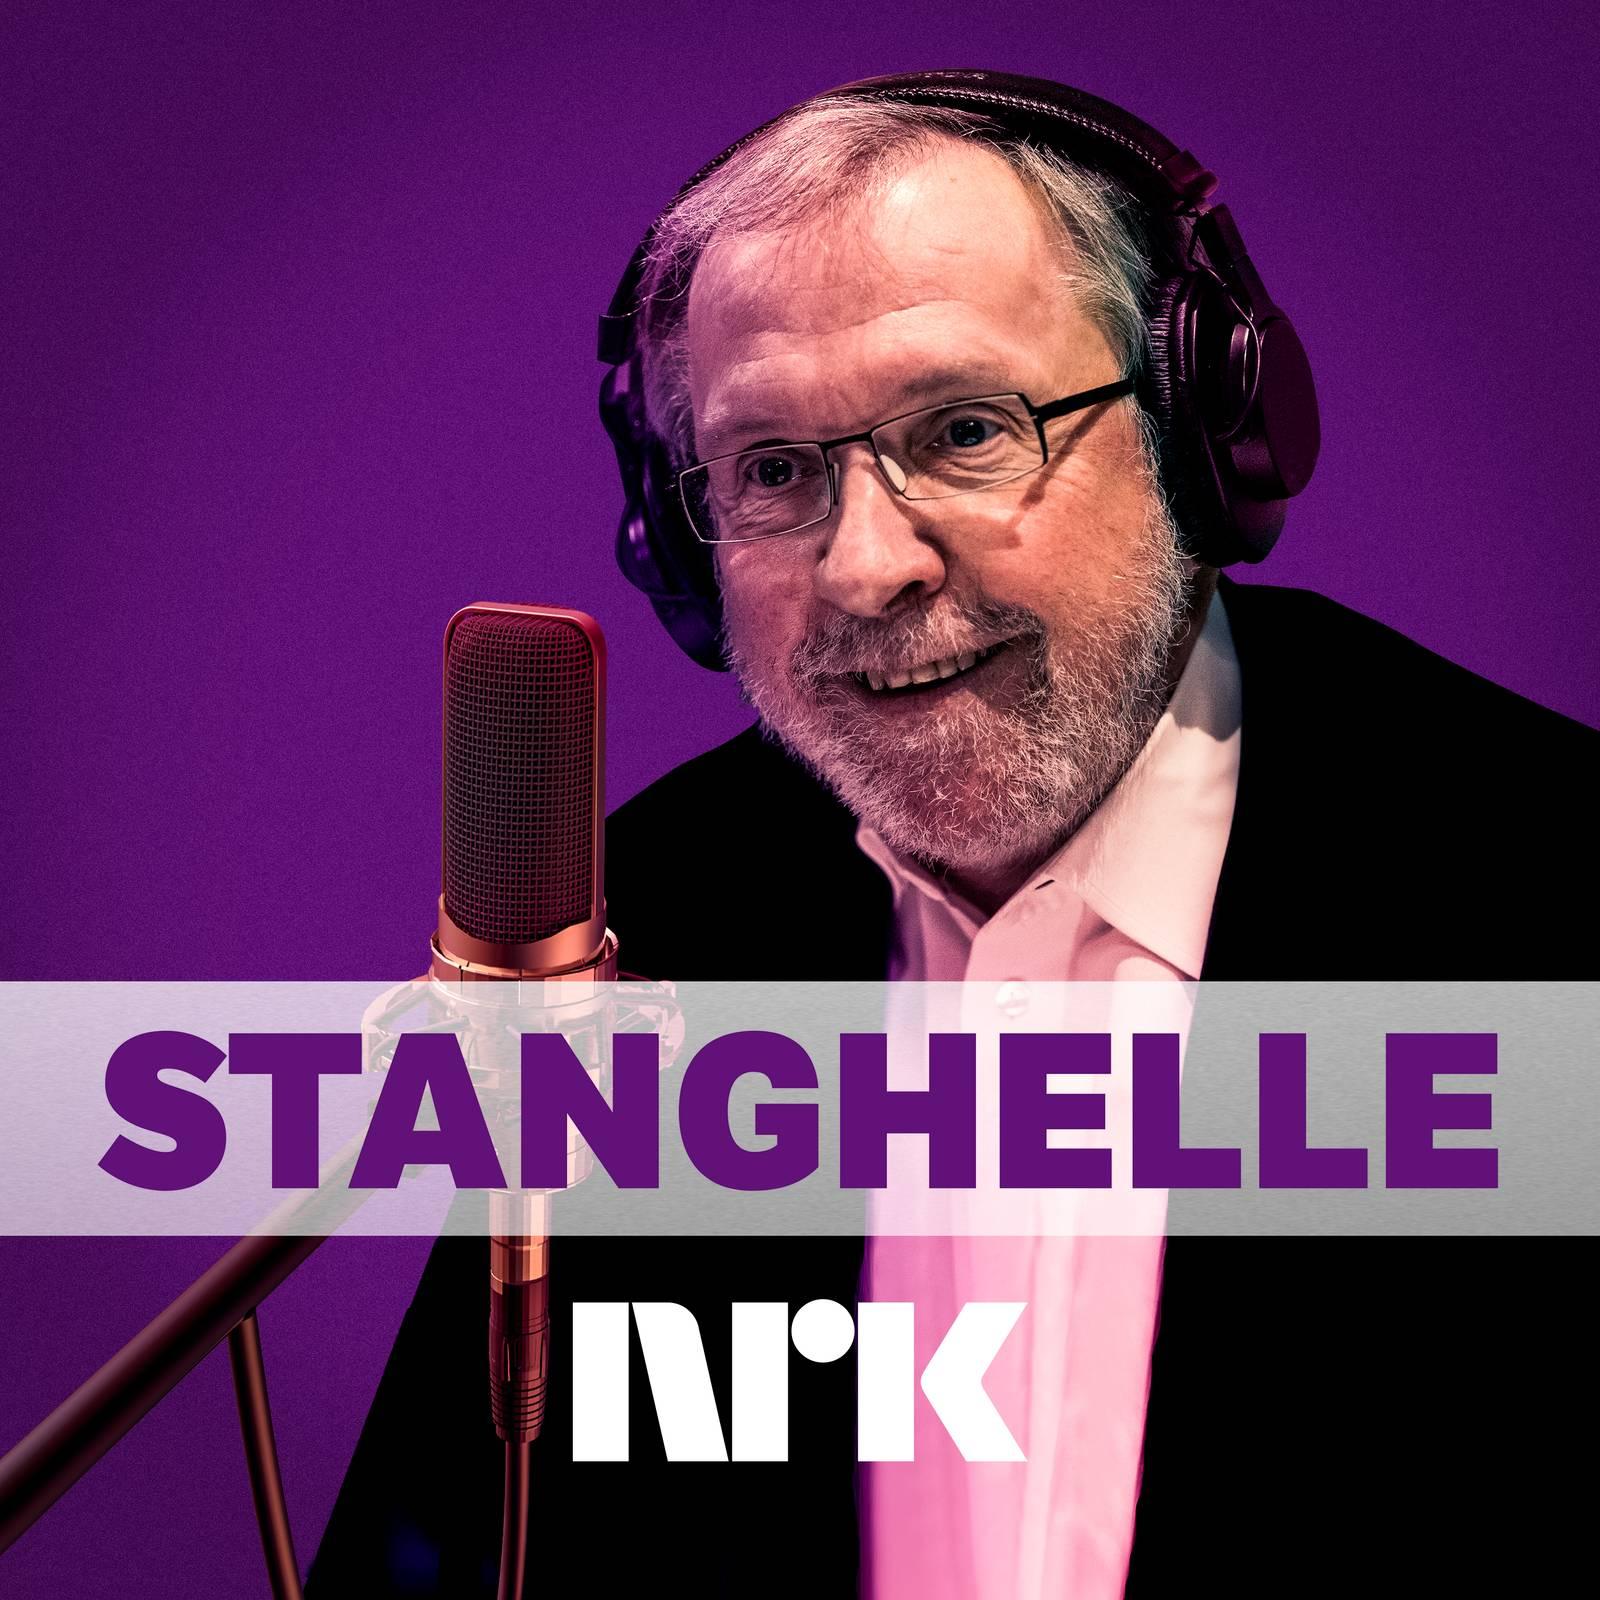 Stanghelle